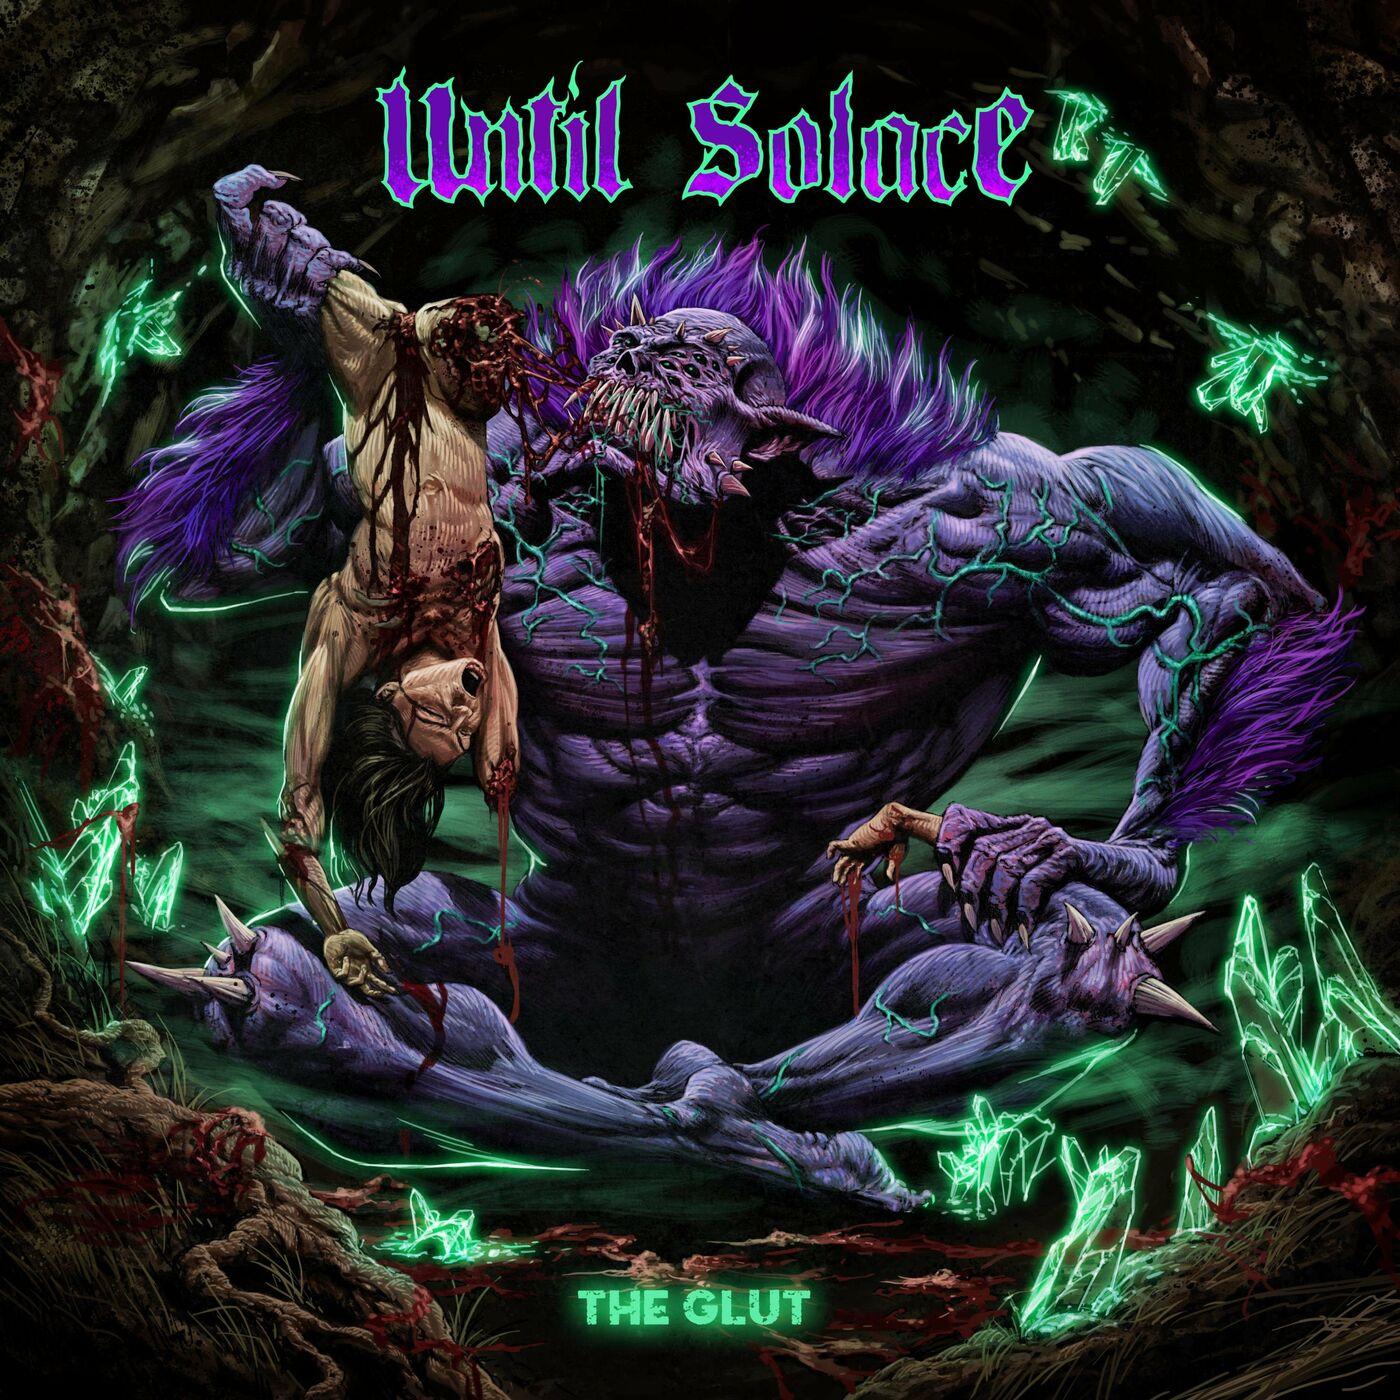 Until Solace - The Glut [single] (2021)